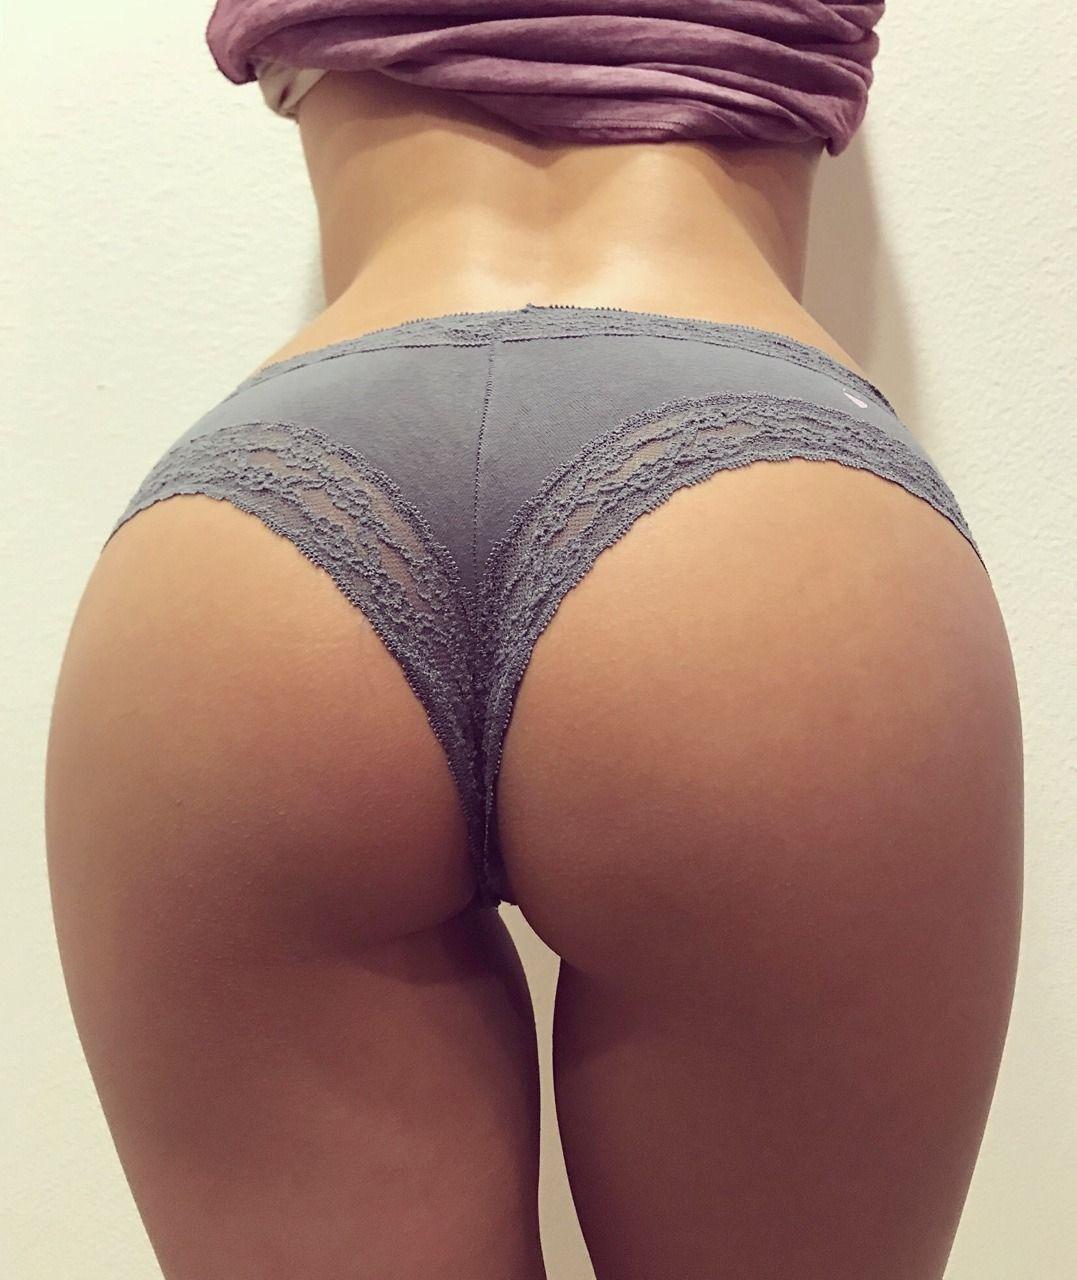 nsfw sexy booty butt | #nsfw #sexy #booty #butt | pin@settimamas